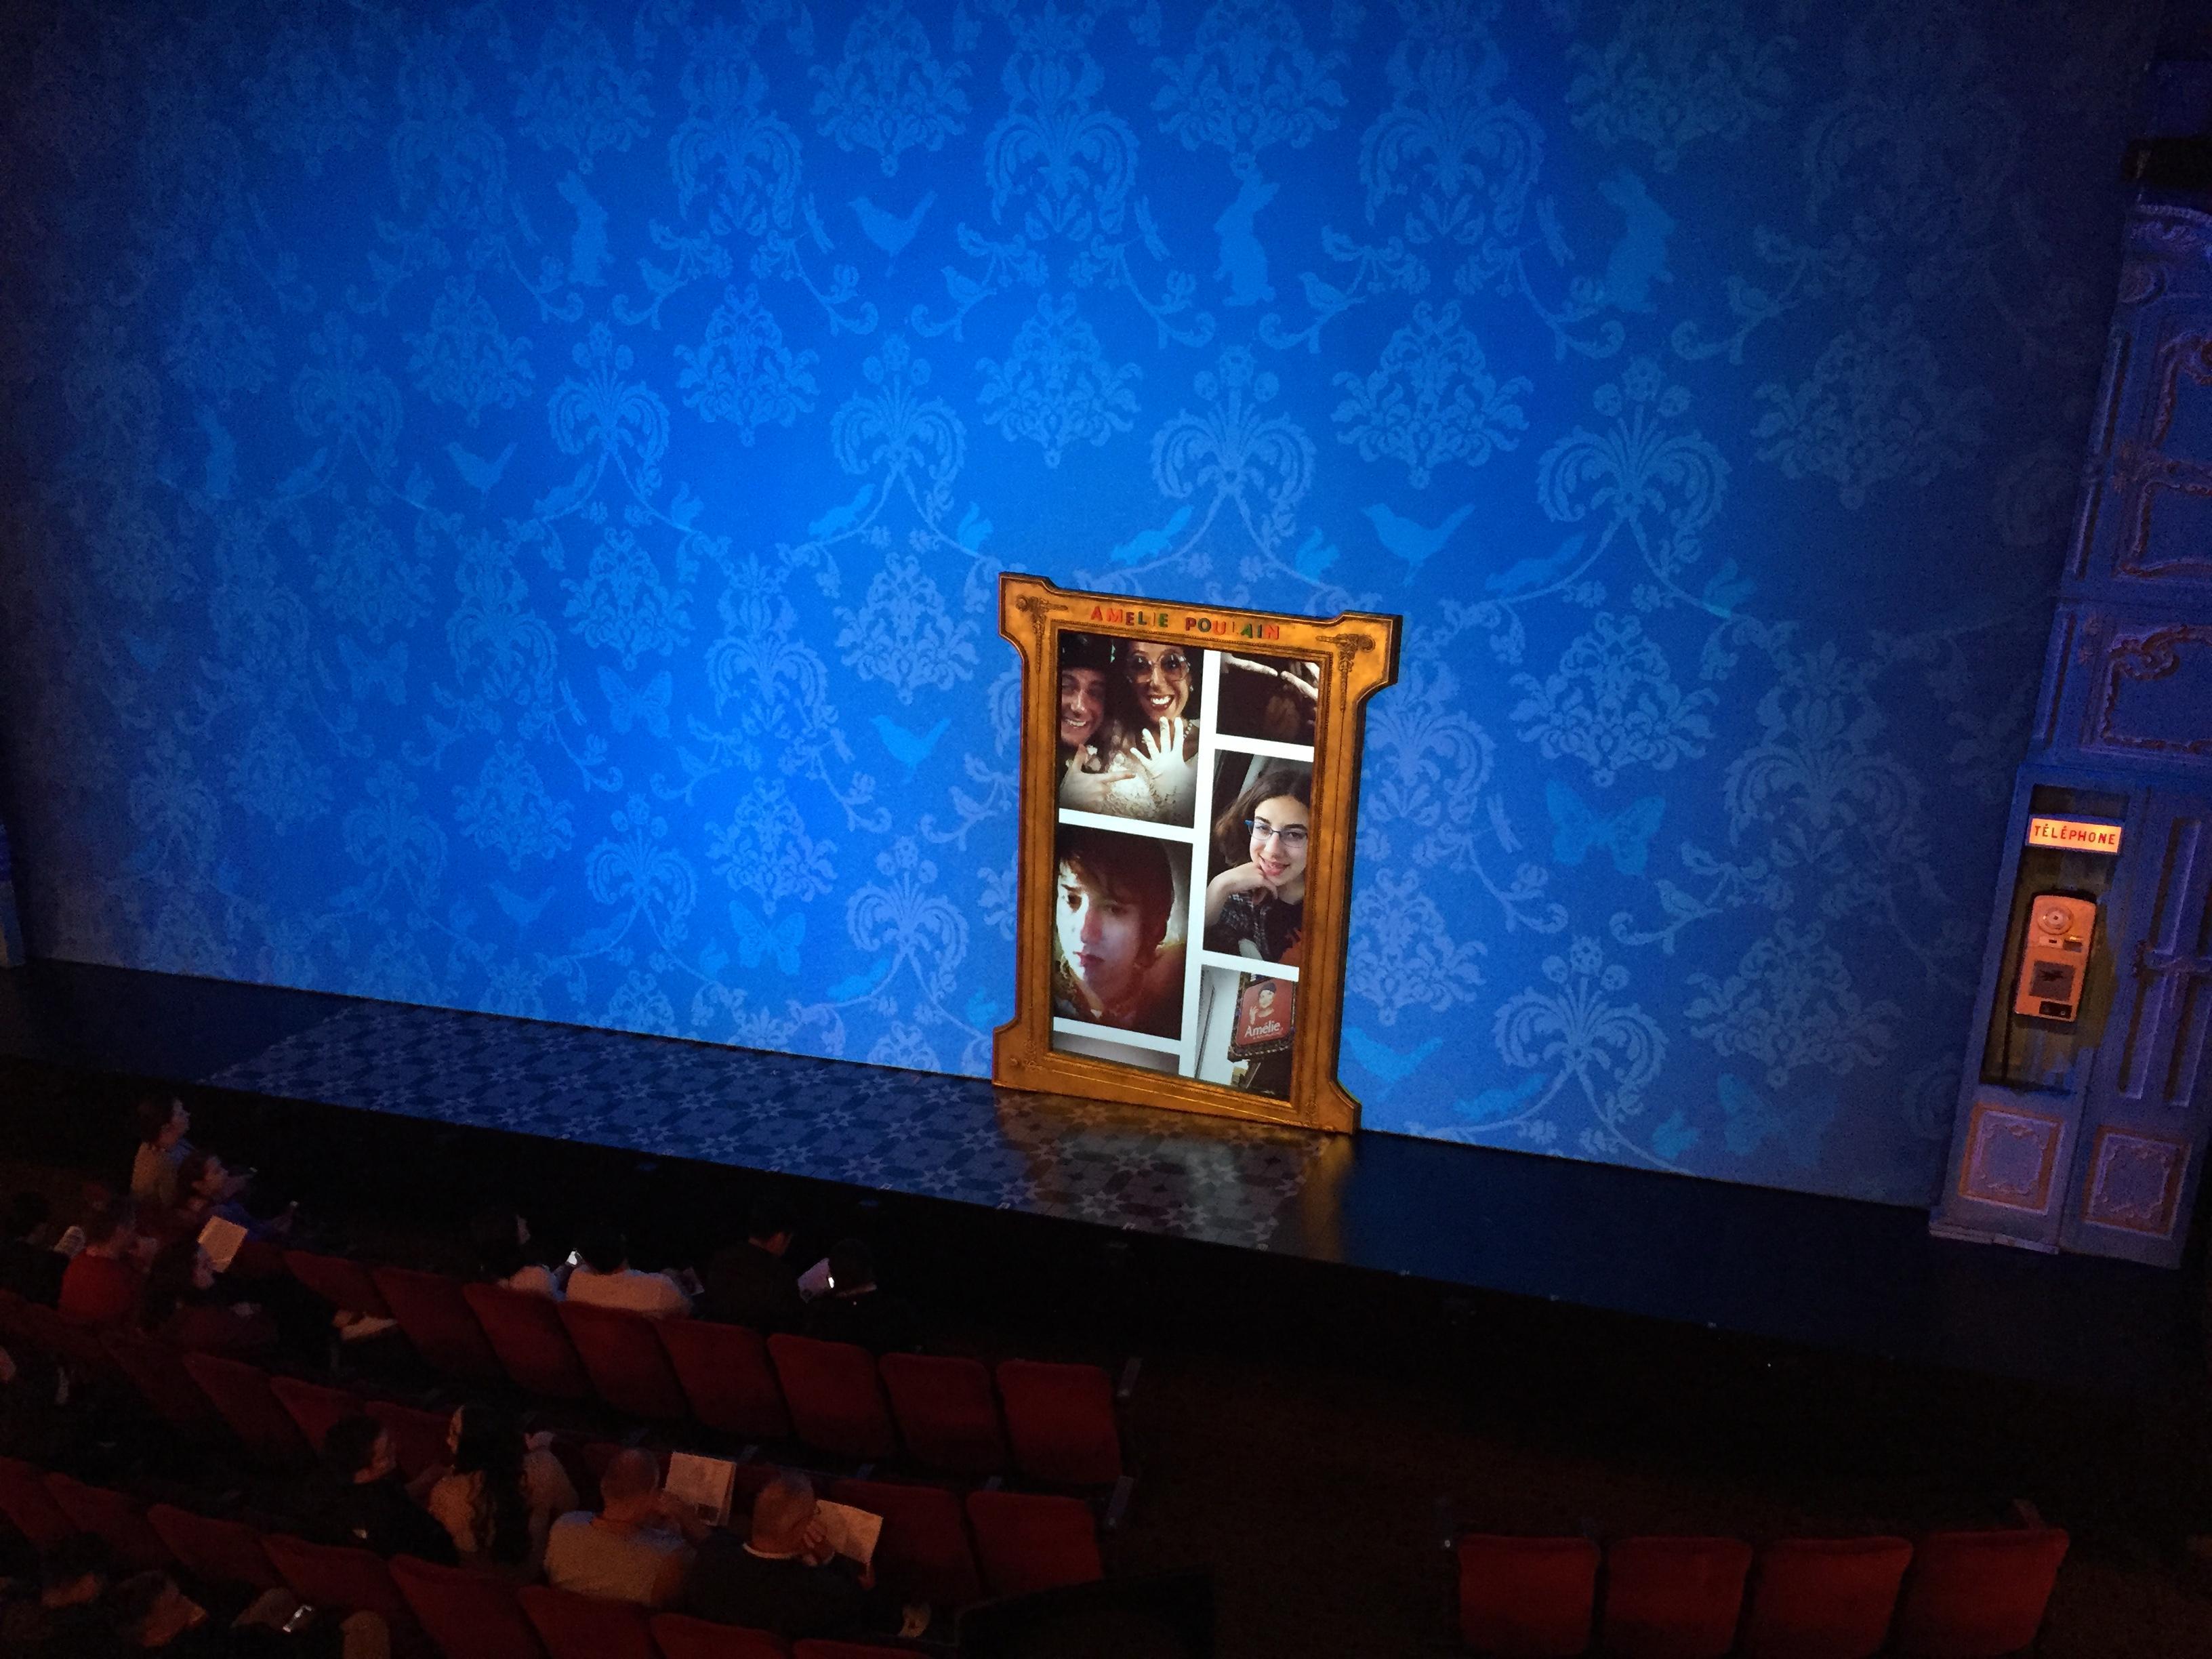 Walter Kerr Theatre Secção Mezzanine R Fila A Lugar 6